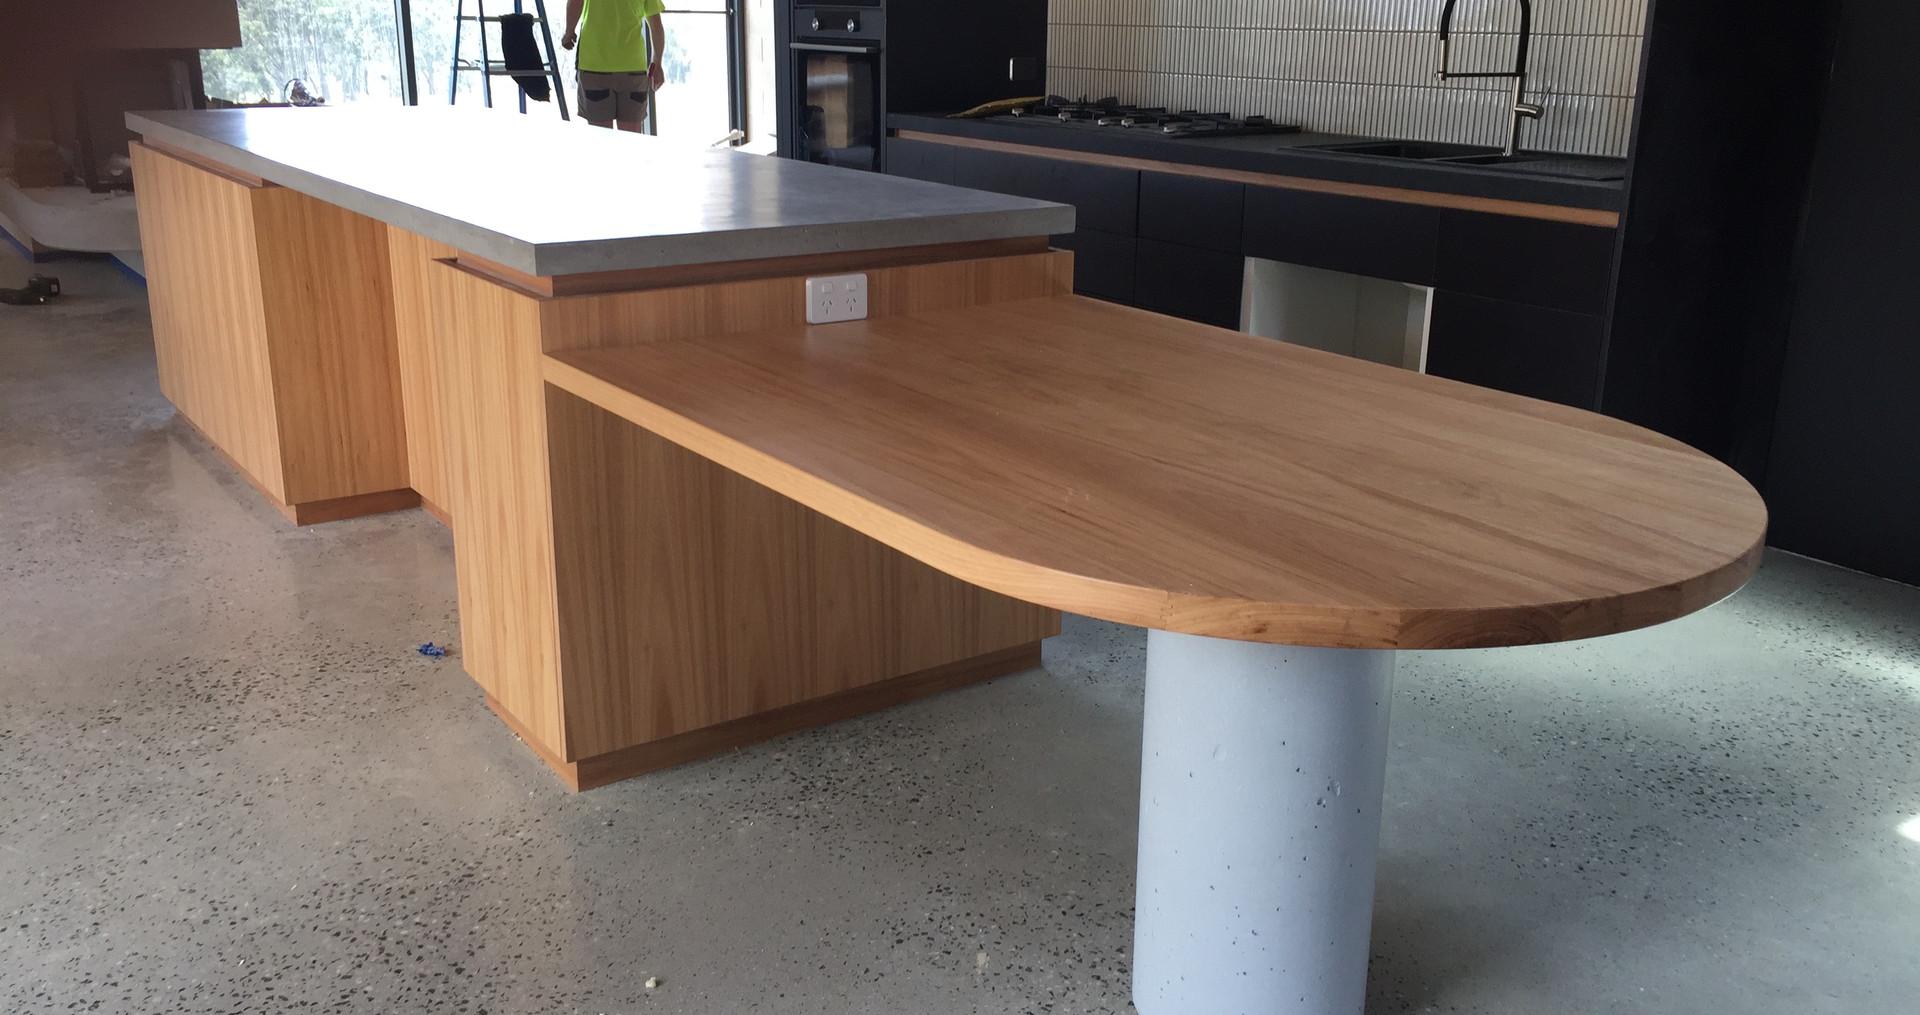 Concrete Kitchen Bench with Concrete Column